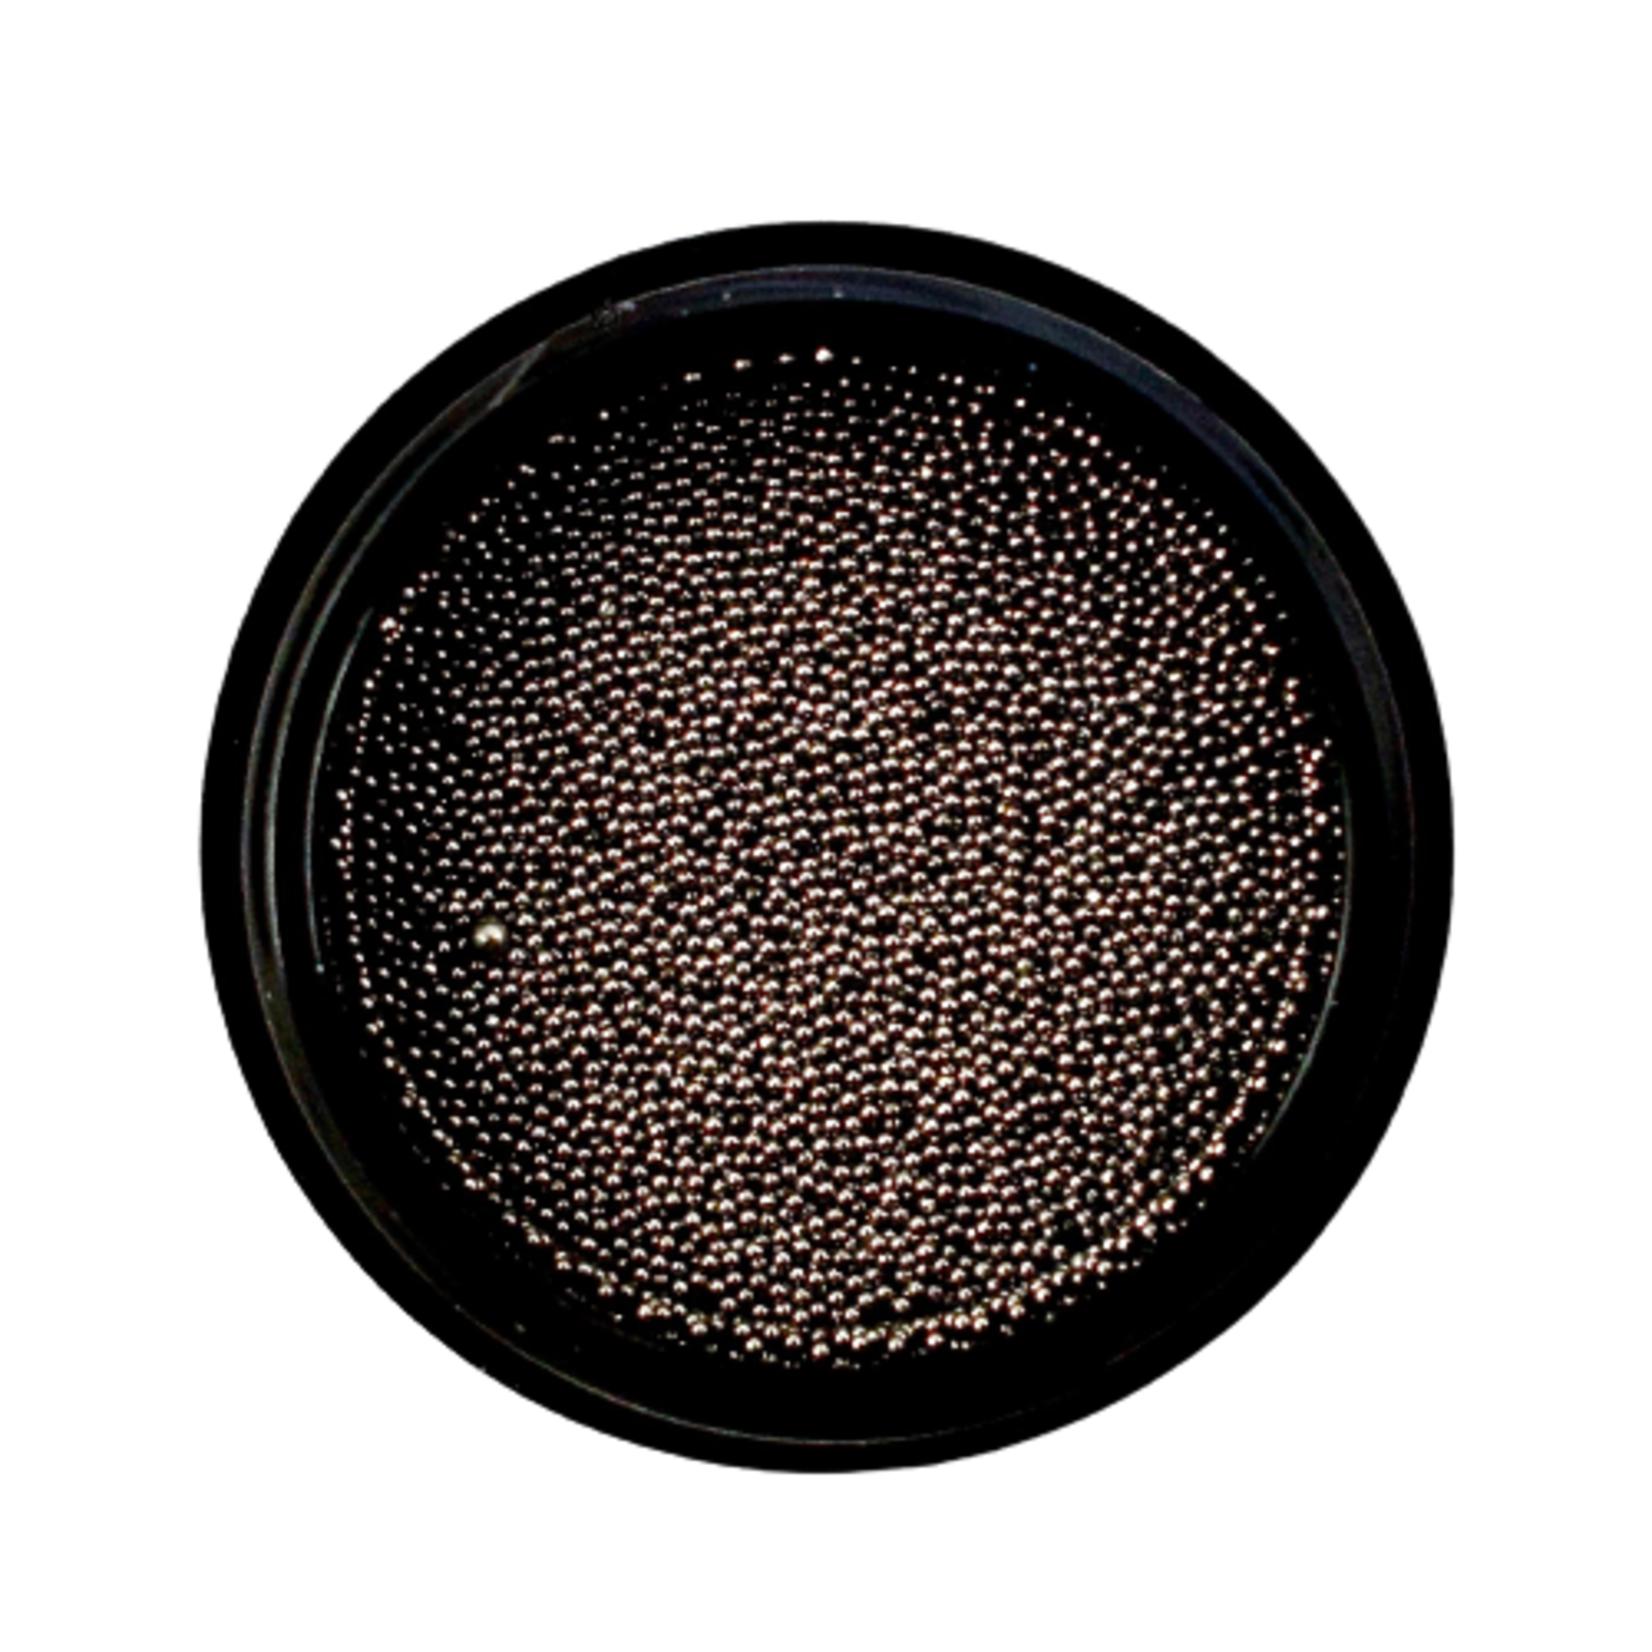 Urban Nails Caviar Beads Gun Metal Black 0.4